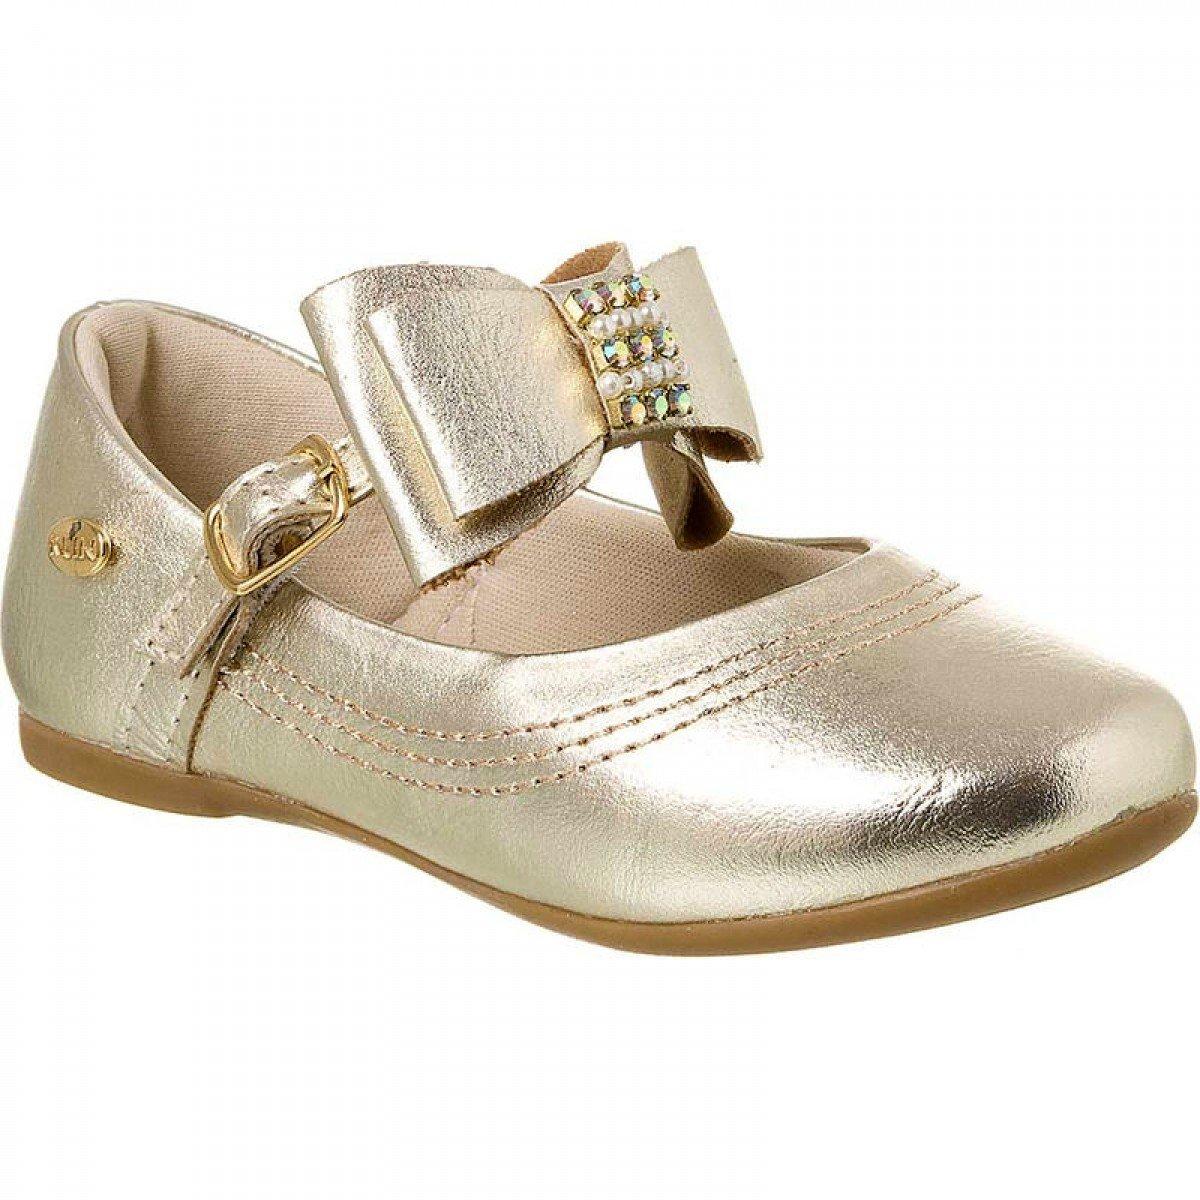 00cafd2f81 Sapatilha Klin Princesa Baby Infantil Dourado - Compre Agora ...